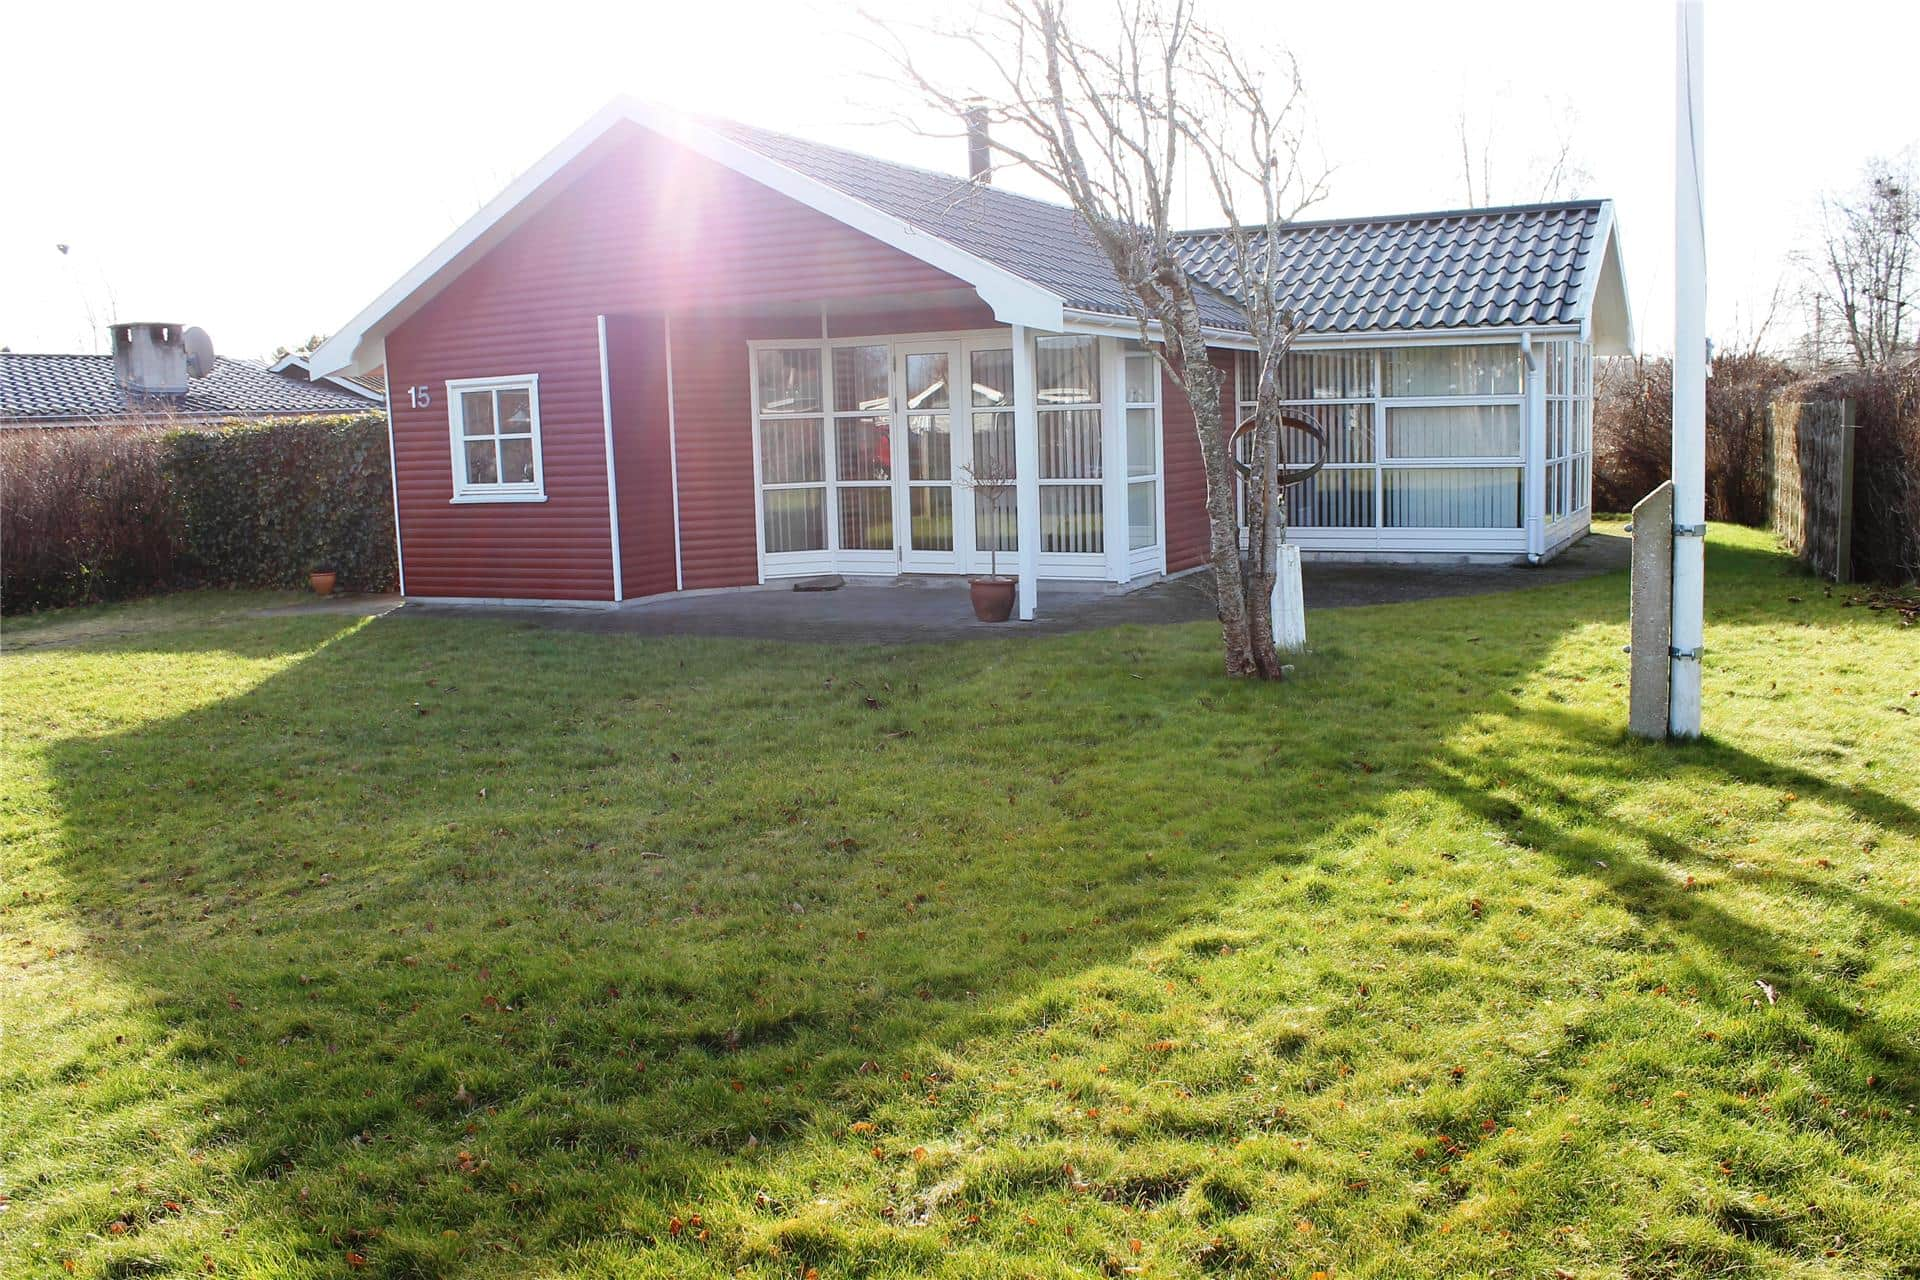 Afbeelding 1-23 Vakantiehuis 8524, Lindevej 15, DK - 8500 Grenaa